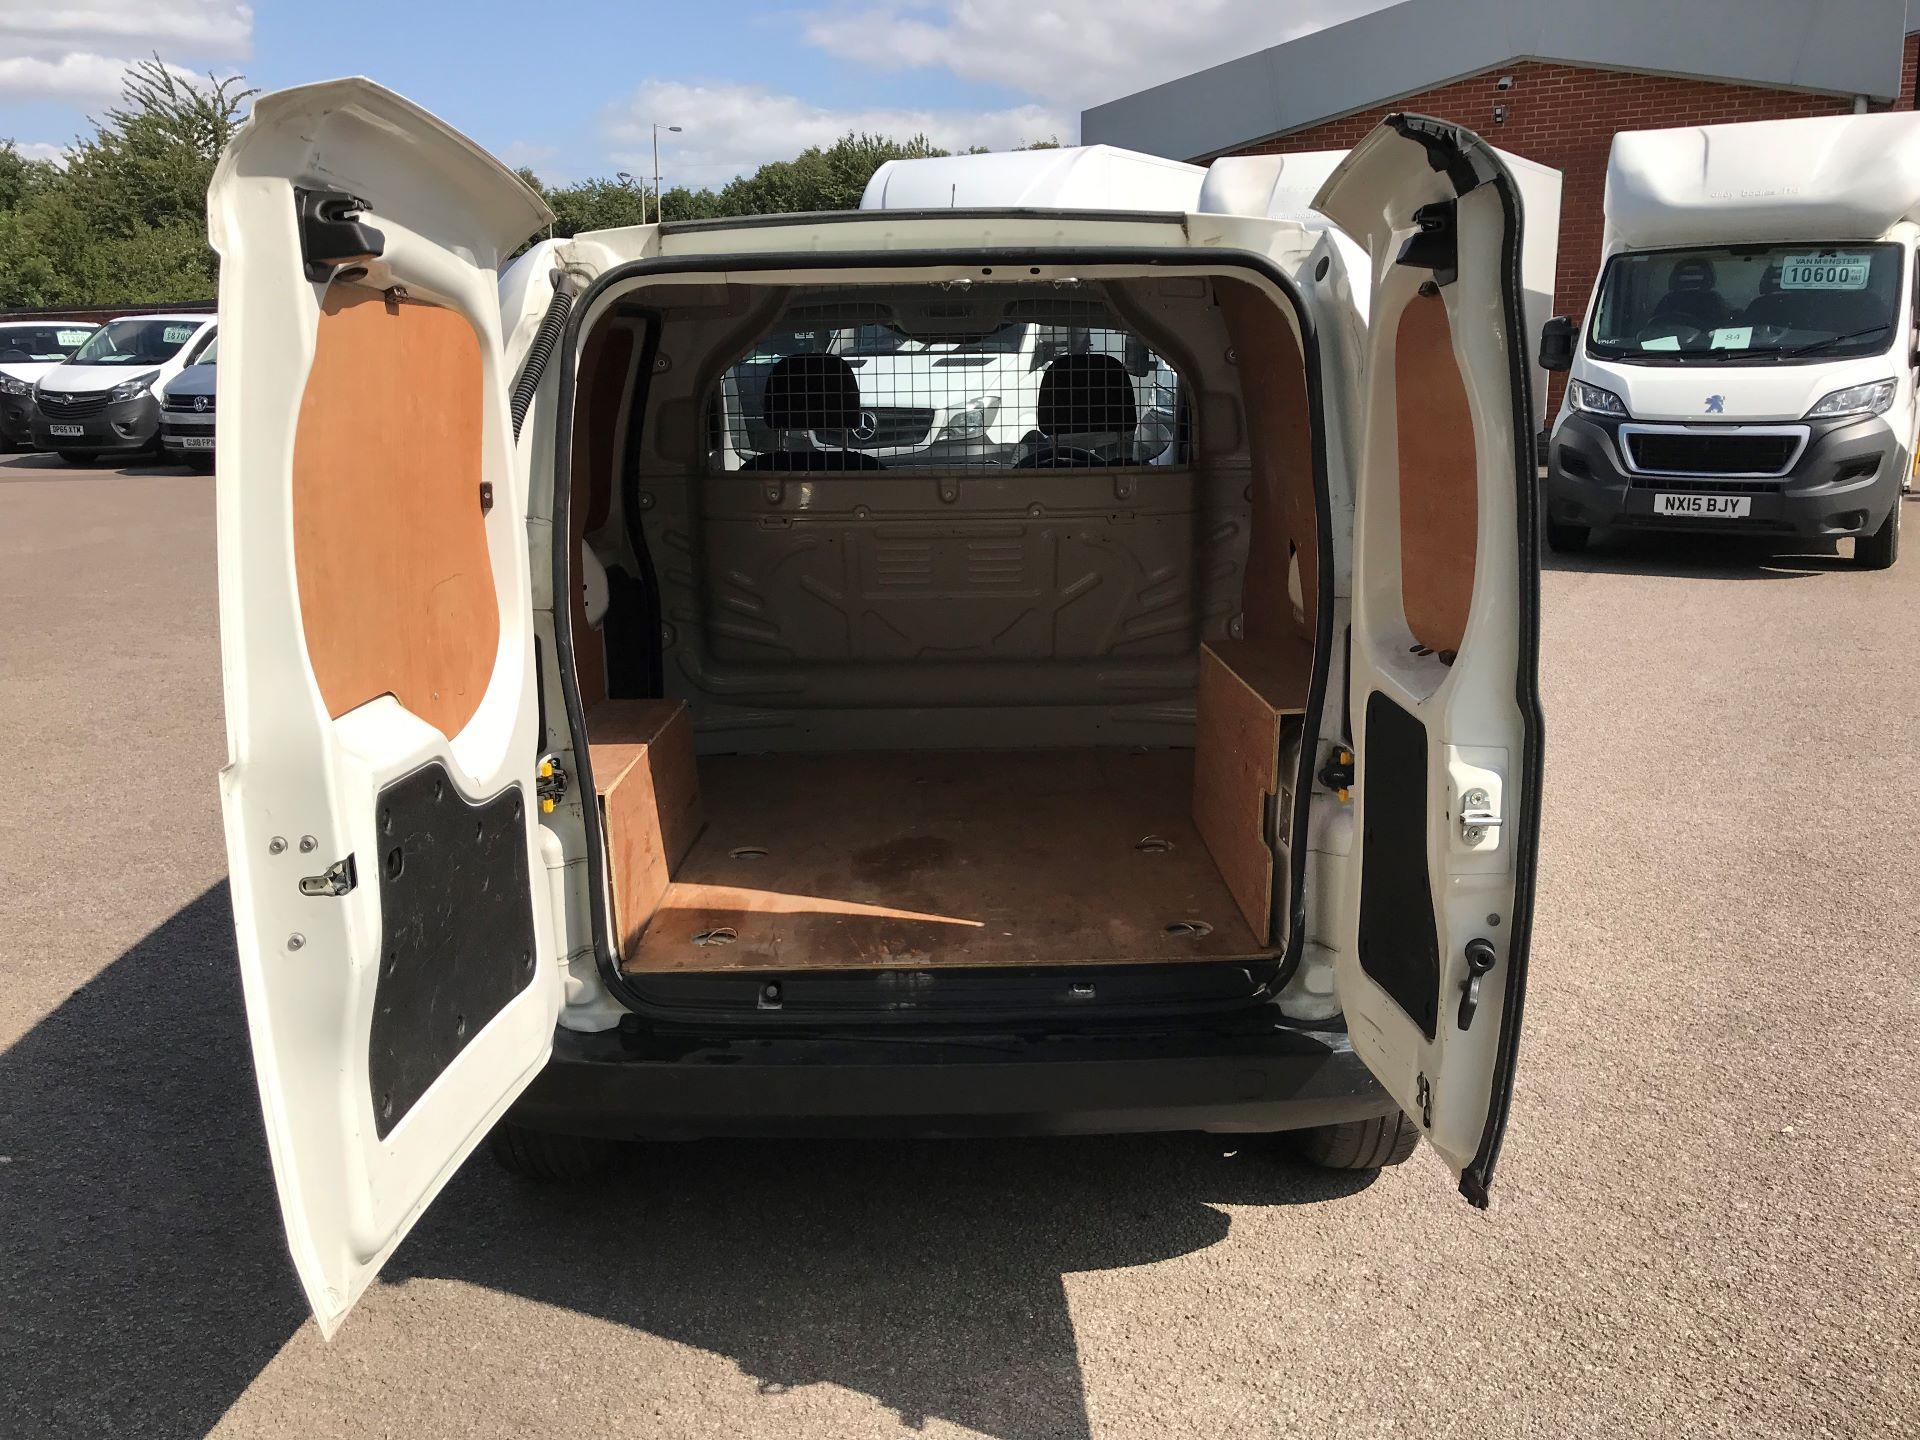 2016 Peugeot Bipper 1.3 Hdi 75 S Plus Pack [Sld] Euro 5 (NU16HFJ) Image 11